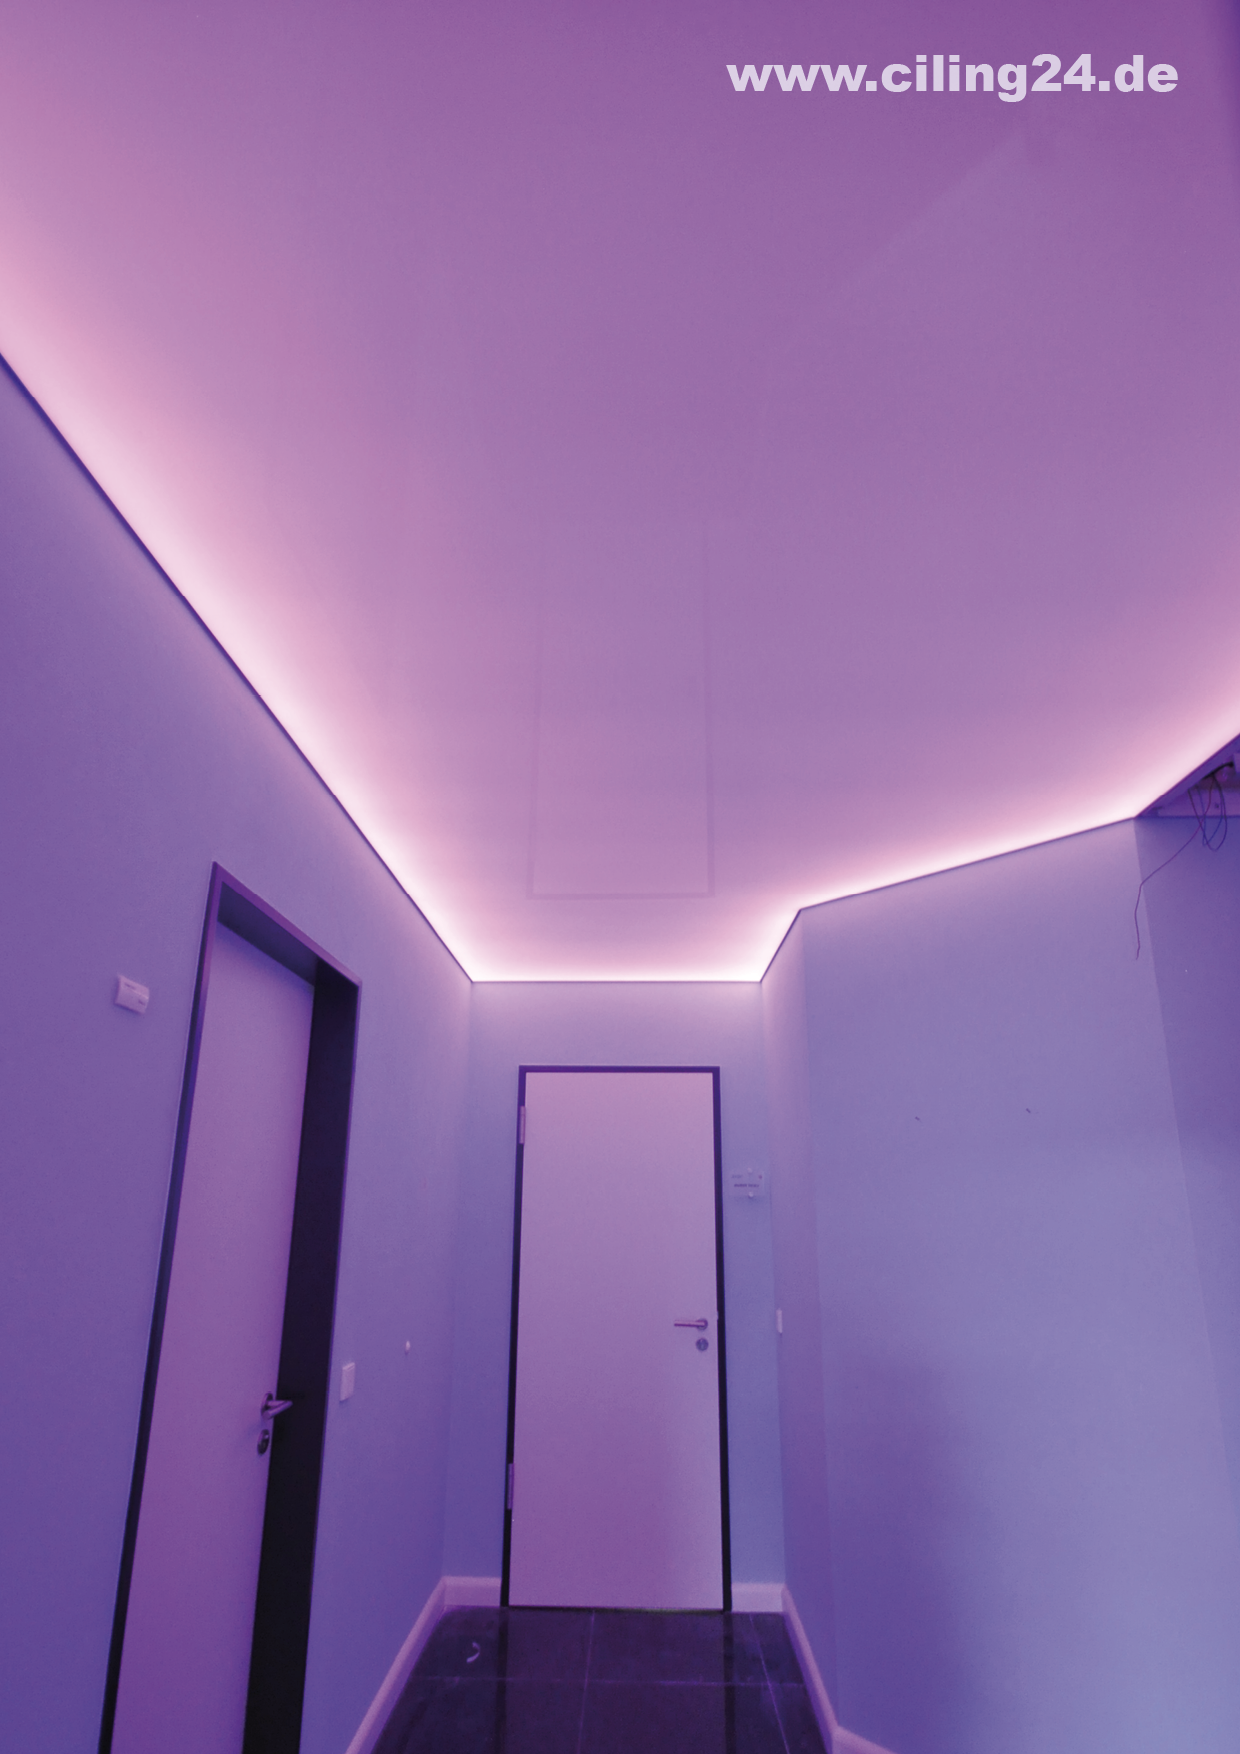 Led Streifen Des Beleuchtungskorridors Rosa Ciling In 2020 Led Leisten Beleuchtung Led